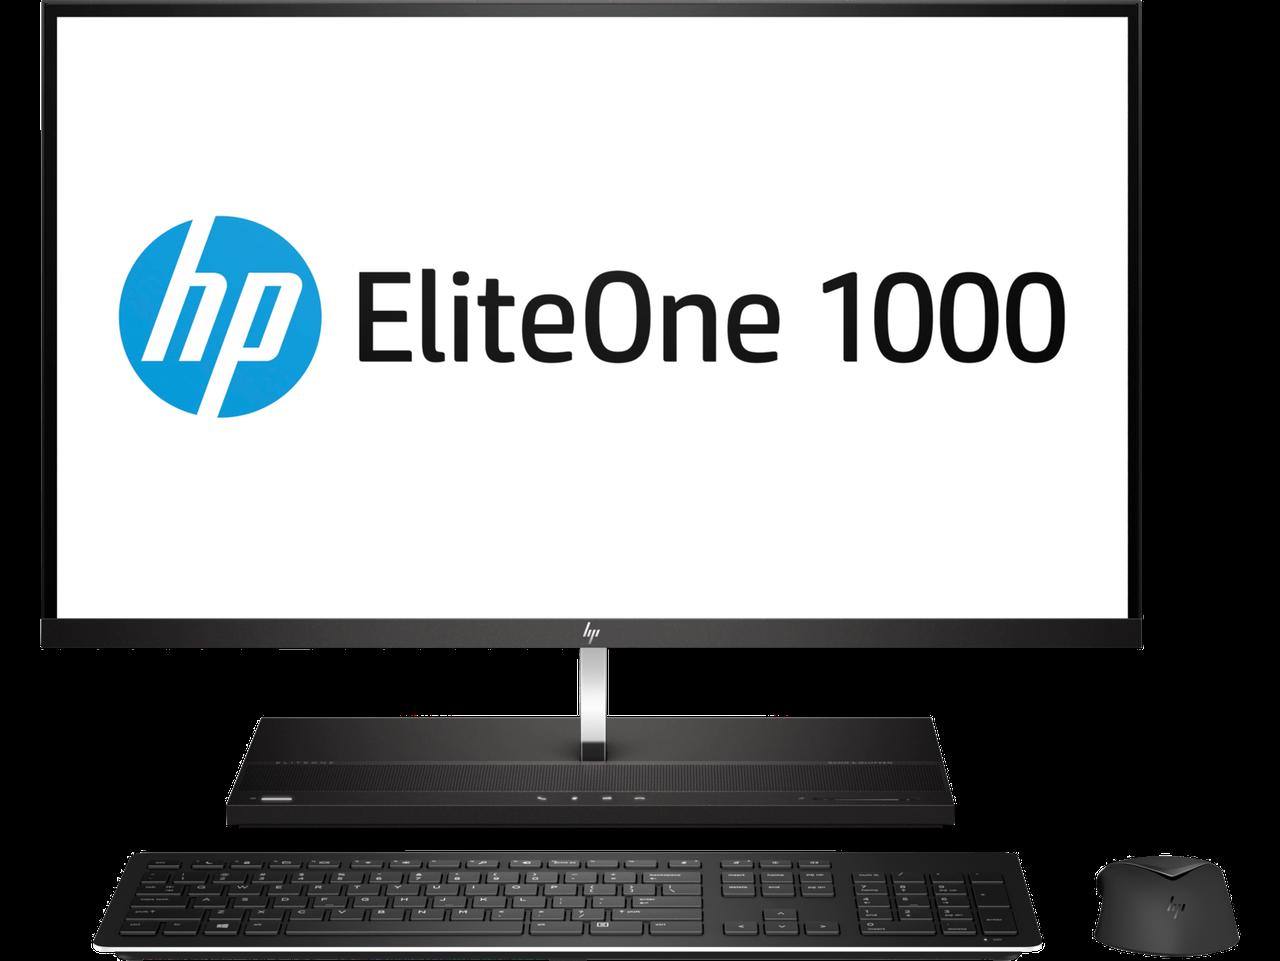 МоноблокHP 3DB53AV+70830640 EliteOne 1000 G2 AiO NT i7-8700 256G+1T 16.0G Win10 Pro 27 4K NT / i7-8700 / 16GB